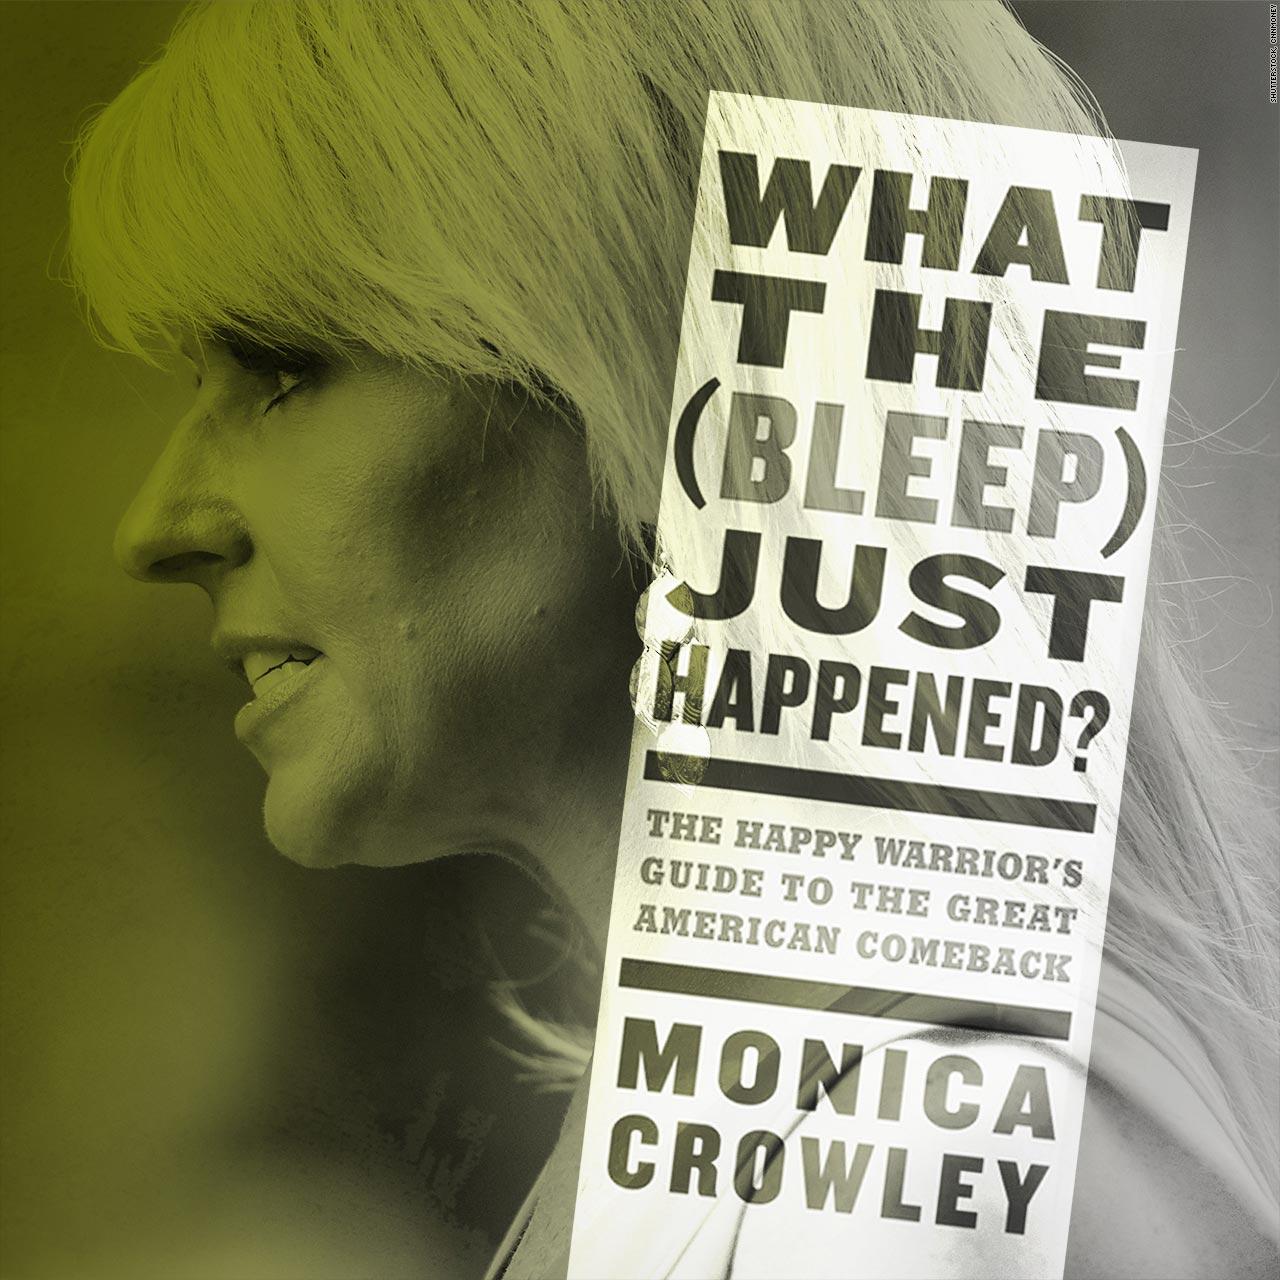 Monica Crowley Porn Days - Trump pick Monica Crowley plagiarized multiple sources in 2012 book -  CNNMoney